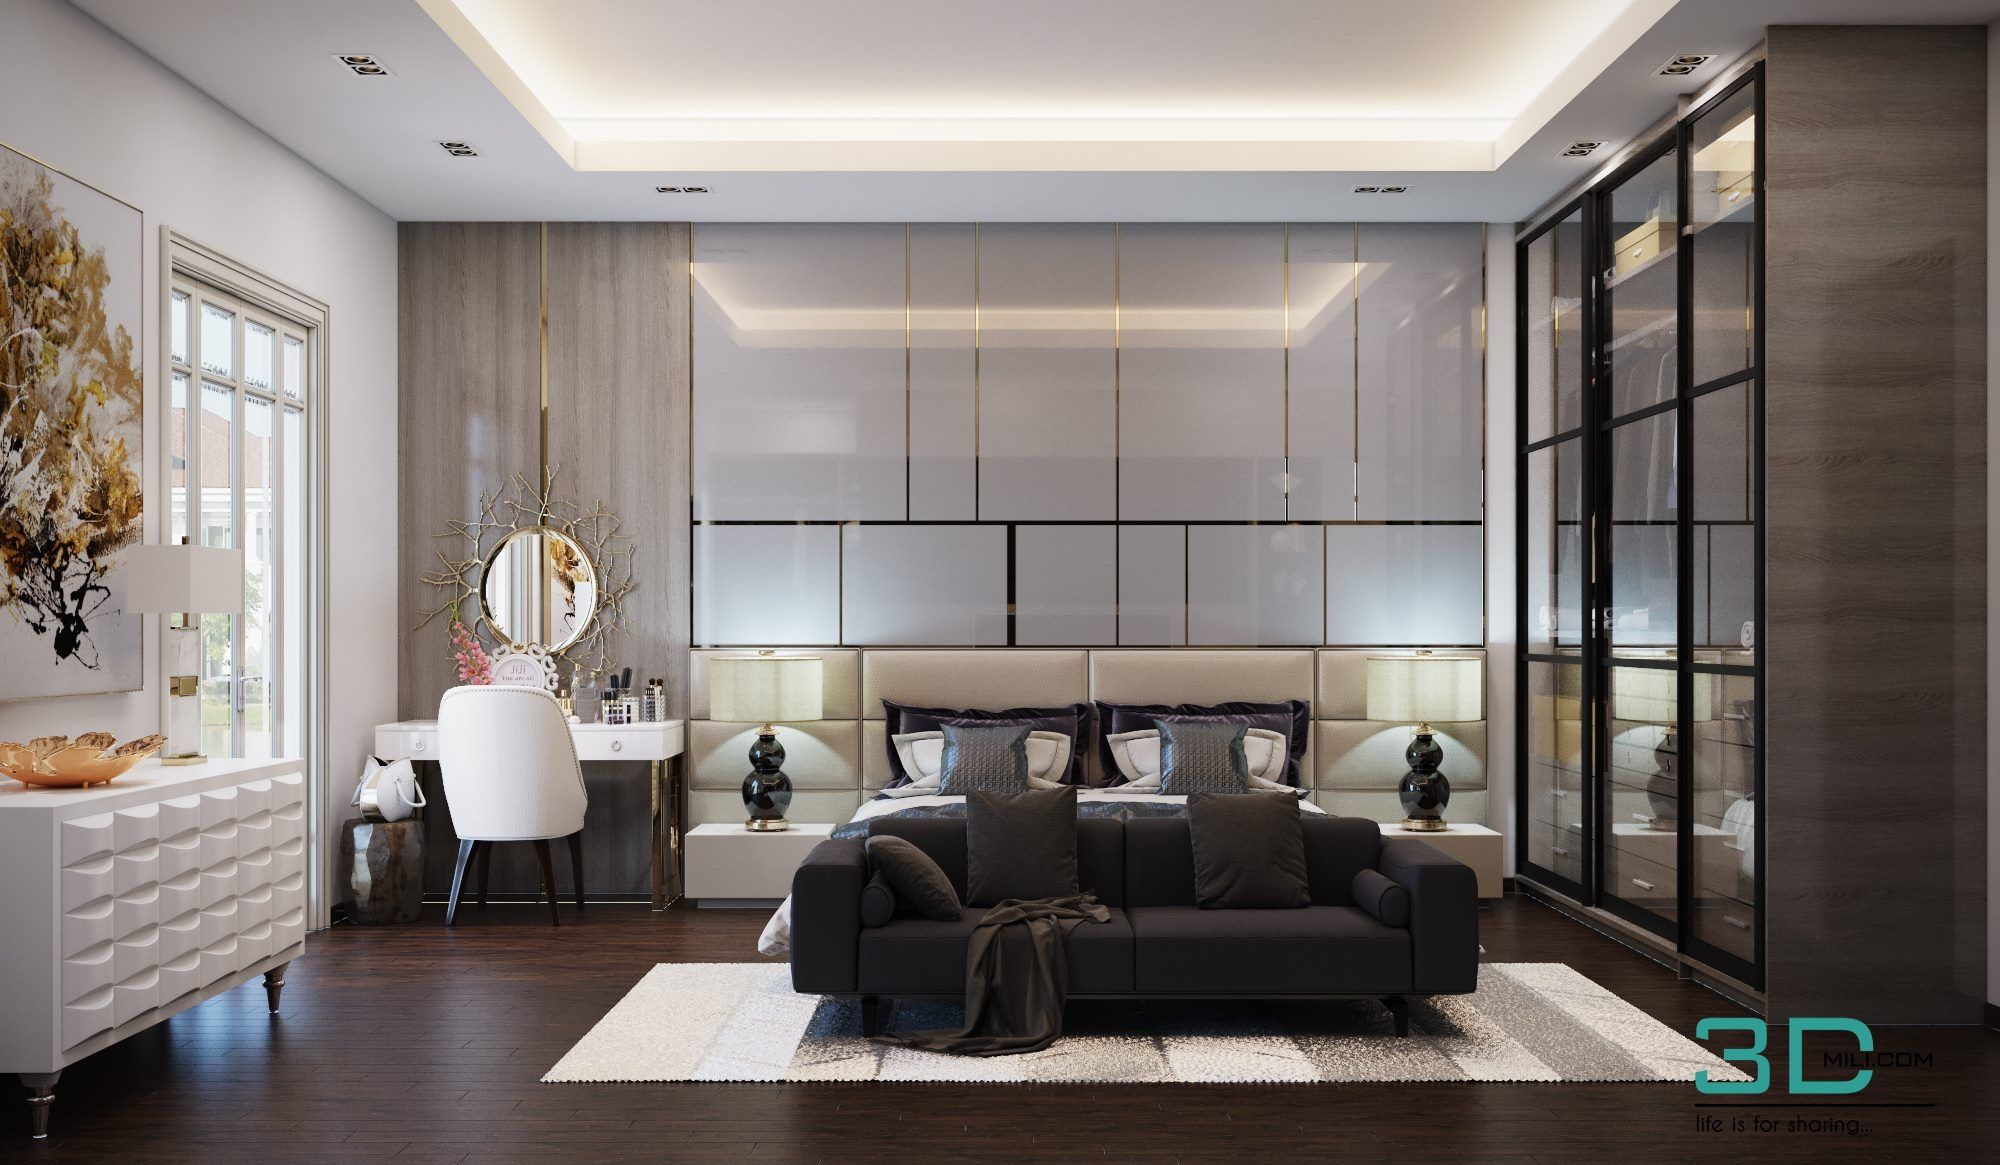 Full Full Room 07 3dsmax File Free Download By Dat Bui Modern Bedroom Interior Interior Design Living Room Apartment Bedroom Design